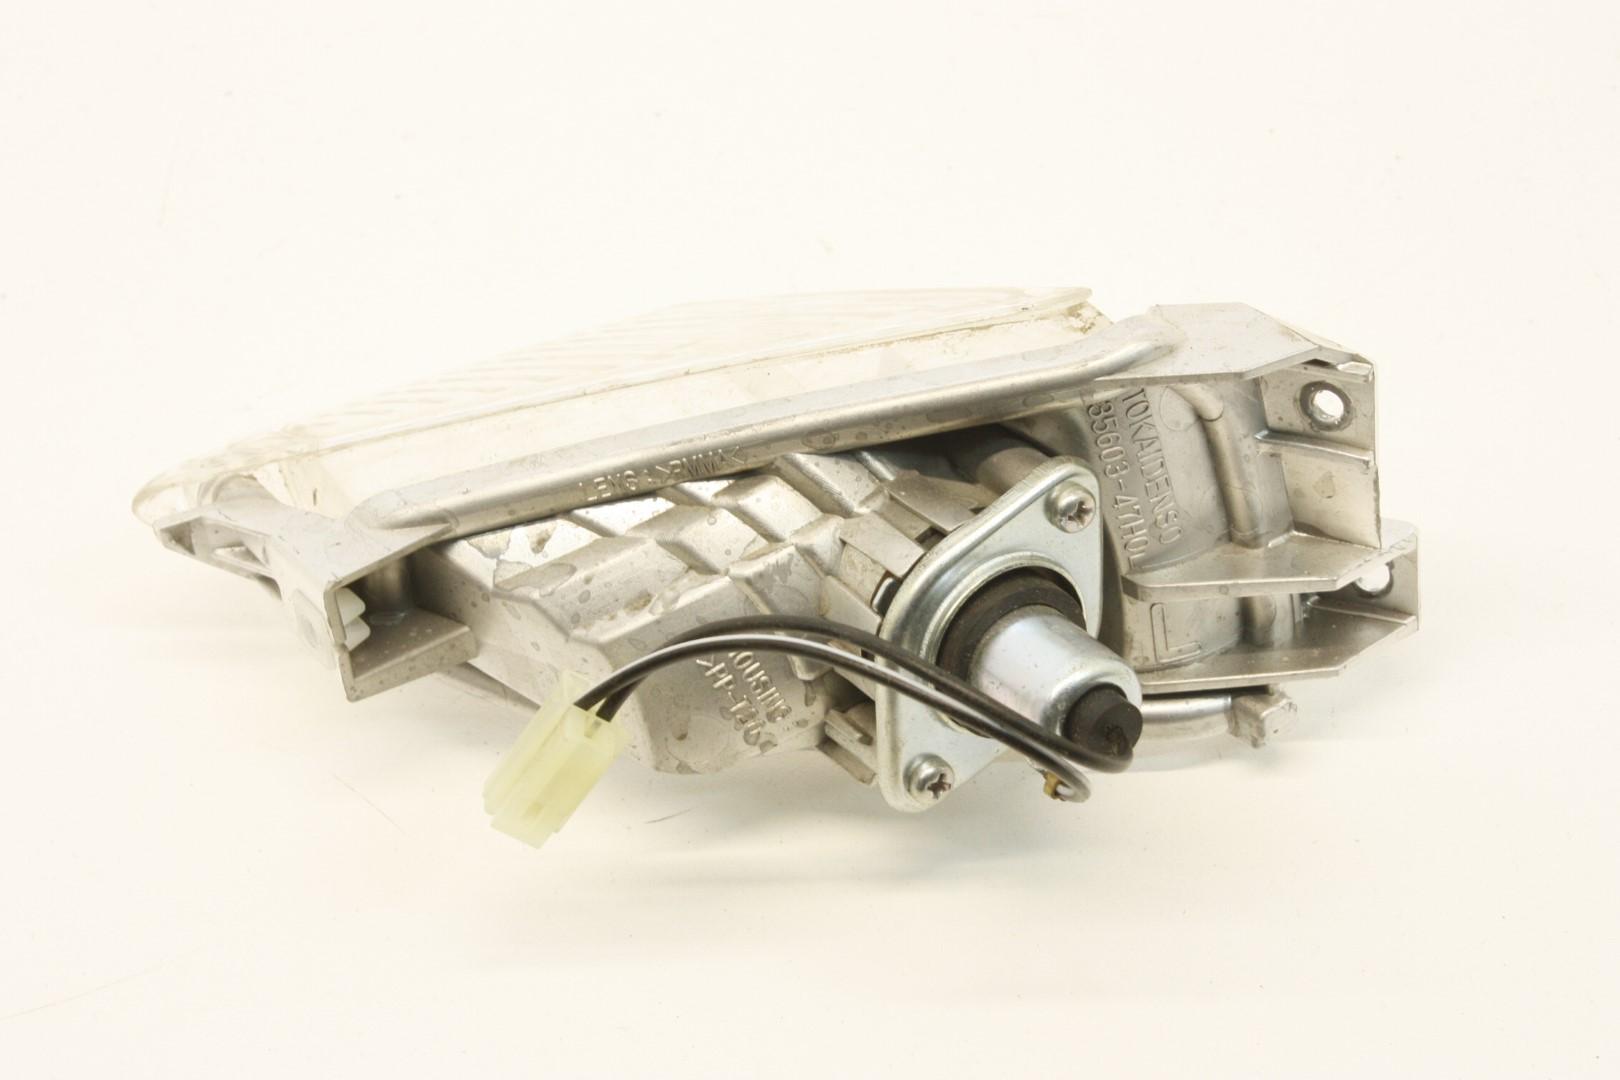 2013-SUZUKI-GSXR-600-REAR-LEFT-SIDE-TURN-SIGNAL-INDICATOR thumbnail 5